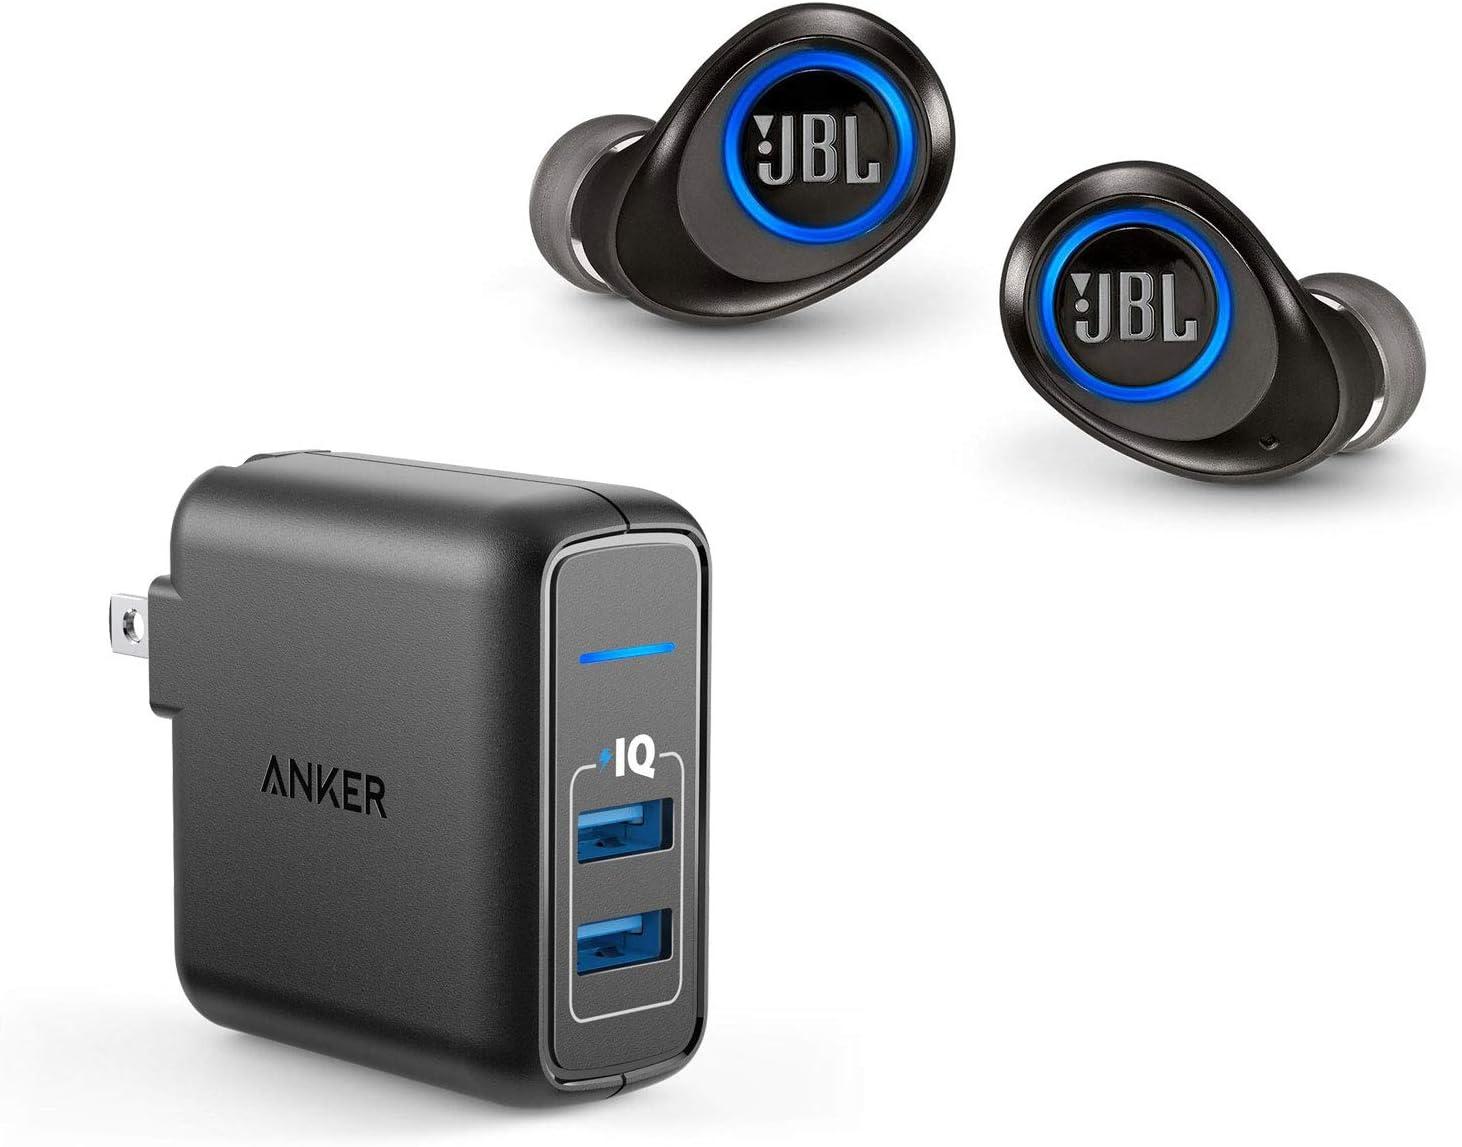 JBL Free X True Wireless in-Ear Bluetooth Headphone Bundle with 2 Port USB Wall Charger - Black